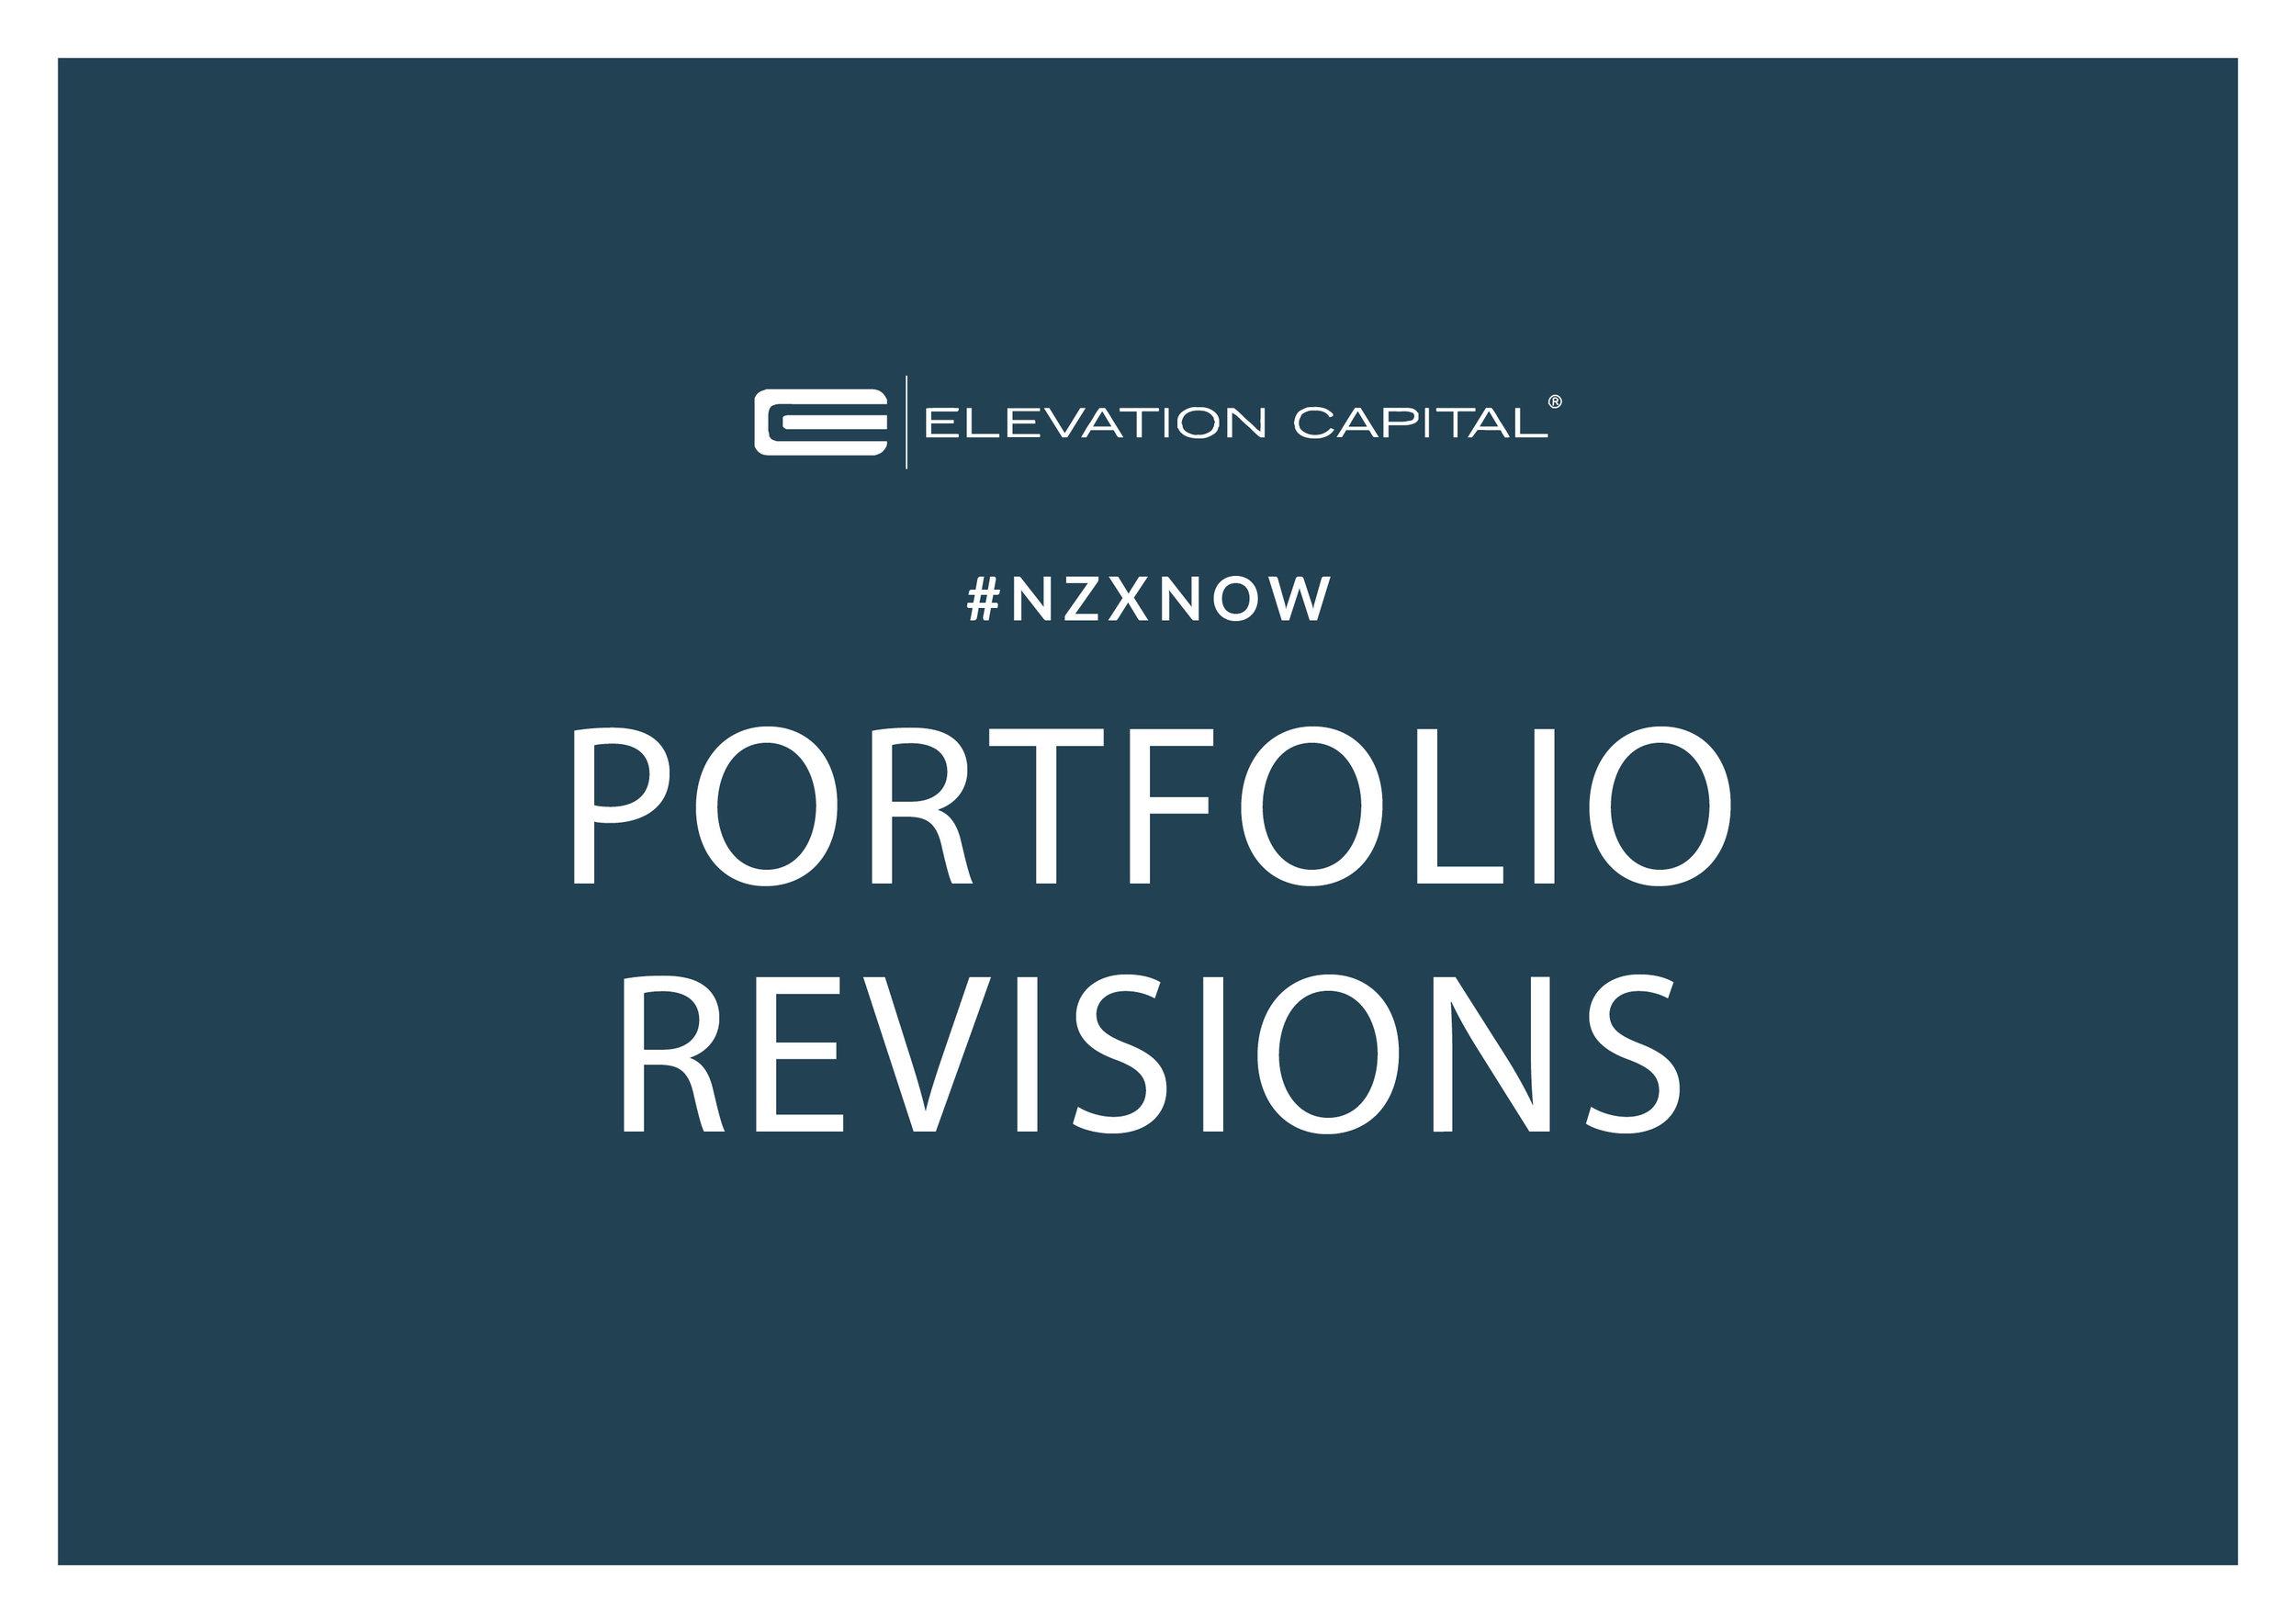 #NZXNOW - Presentation - 1 October 201822.jpg